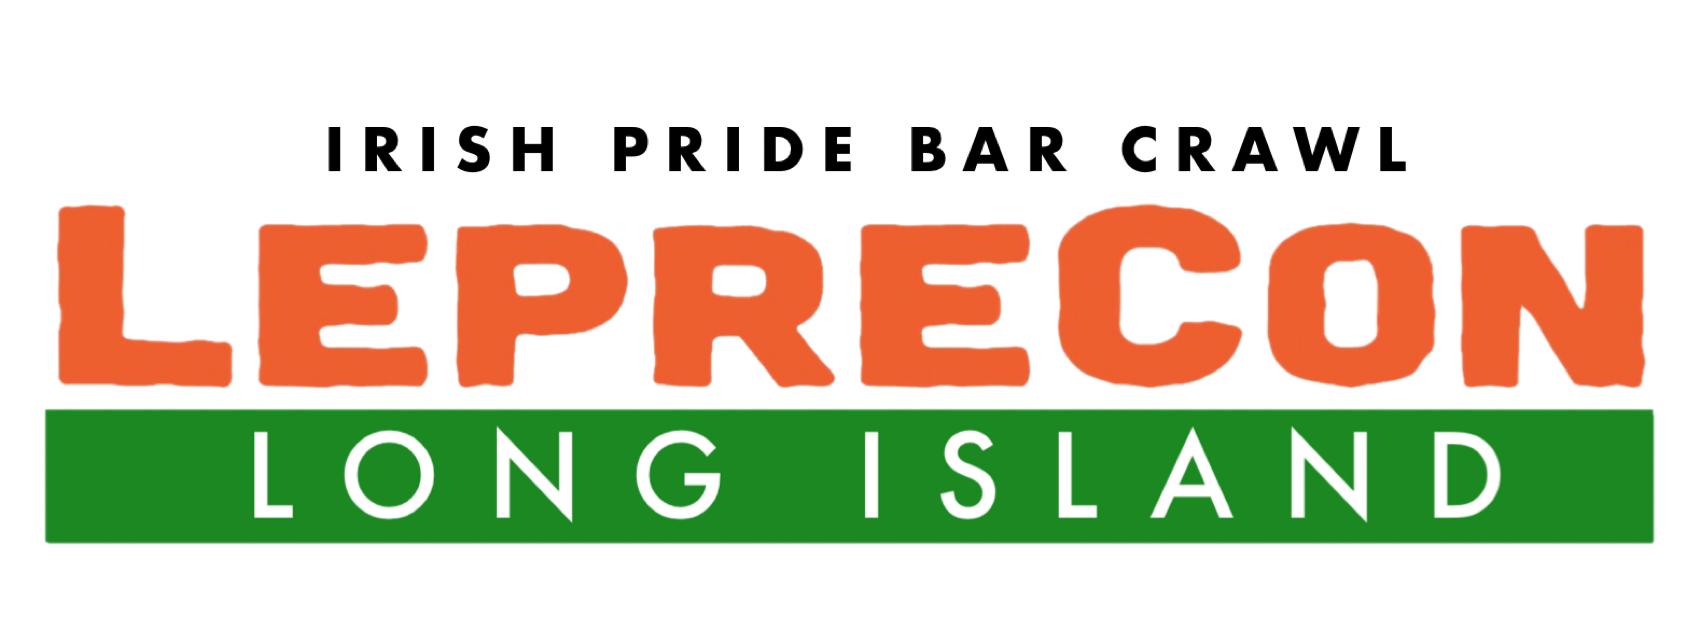 Long Island Pennysaver Com